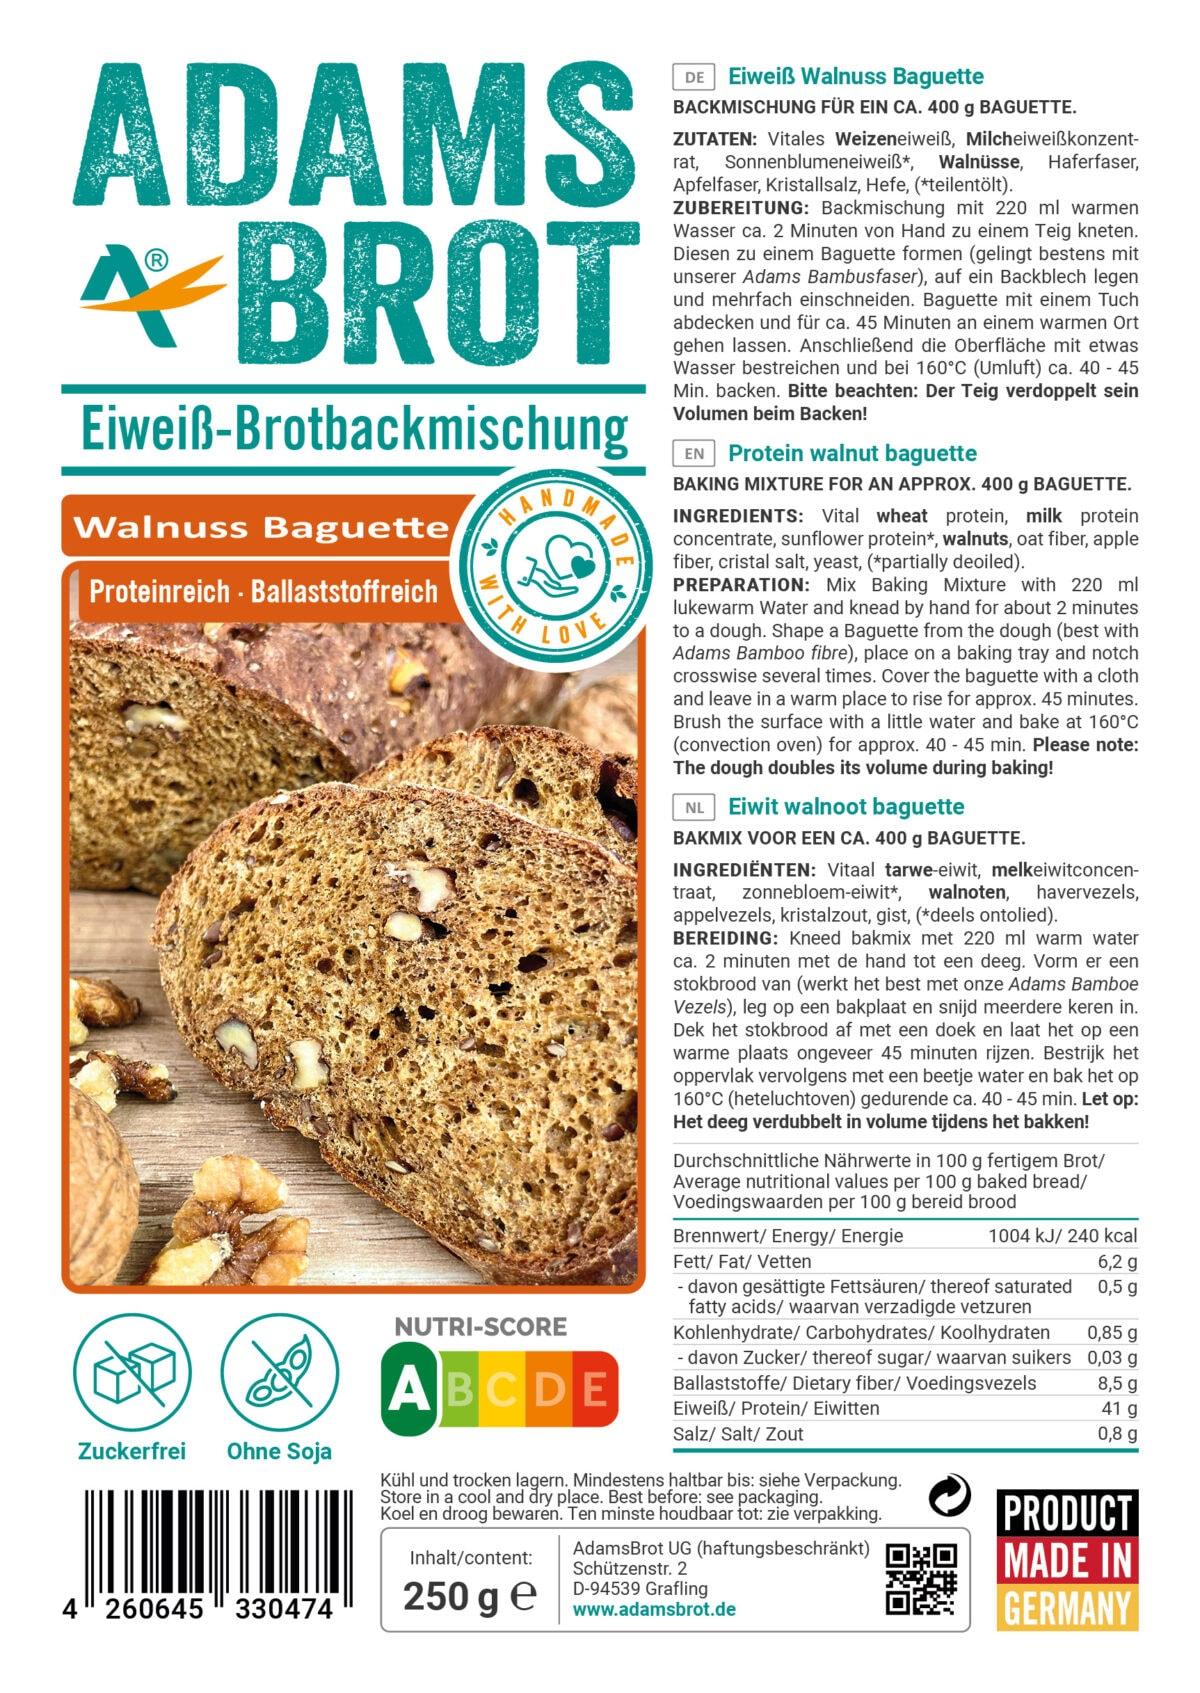 Preparato per baguette low carb